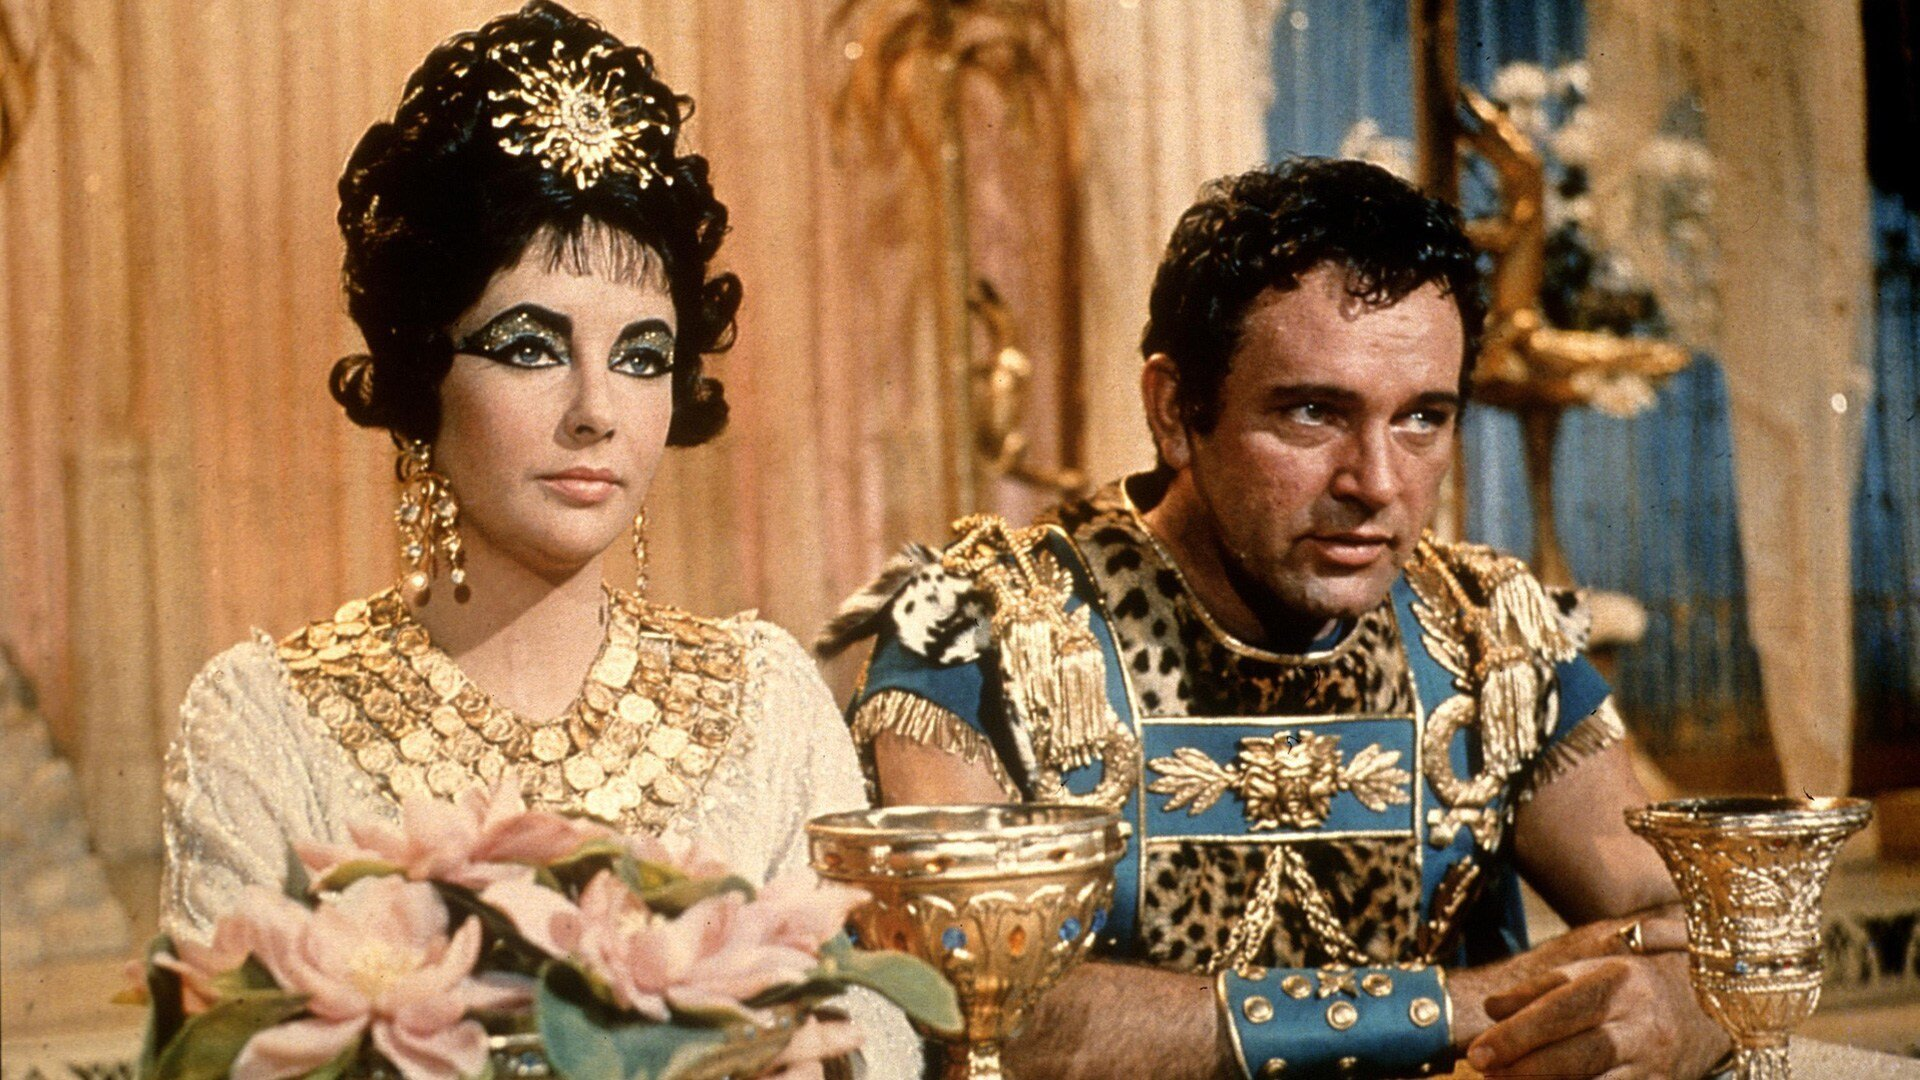 Gadot Cleopatra